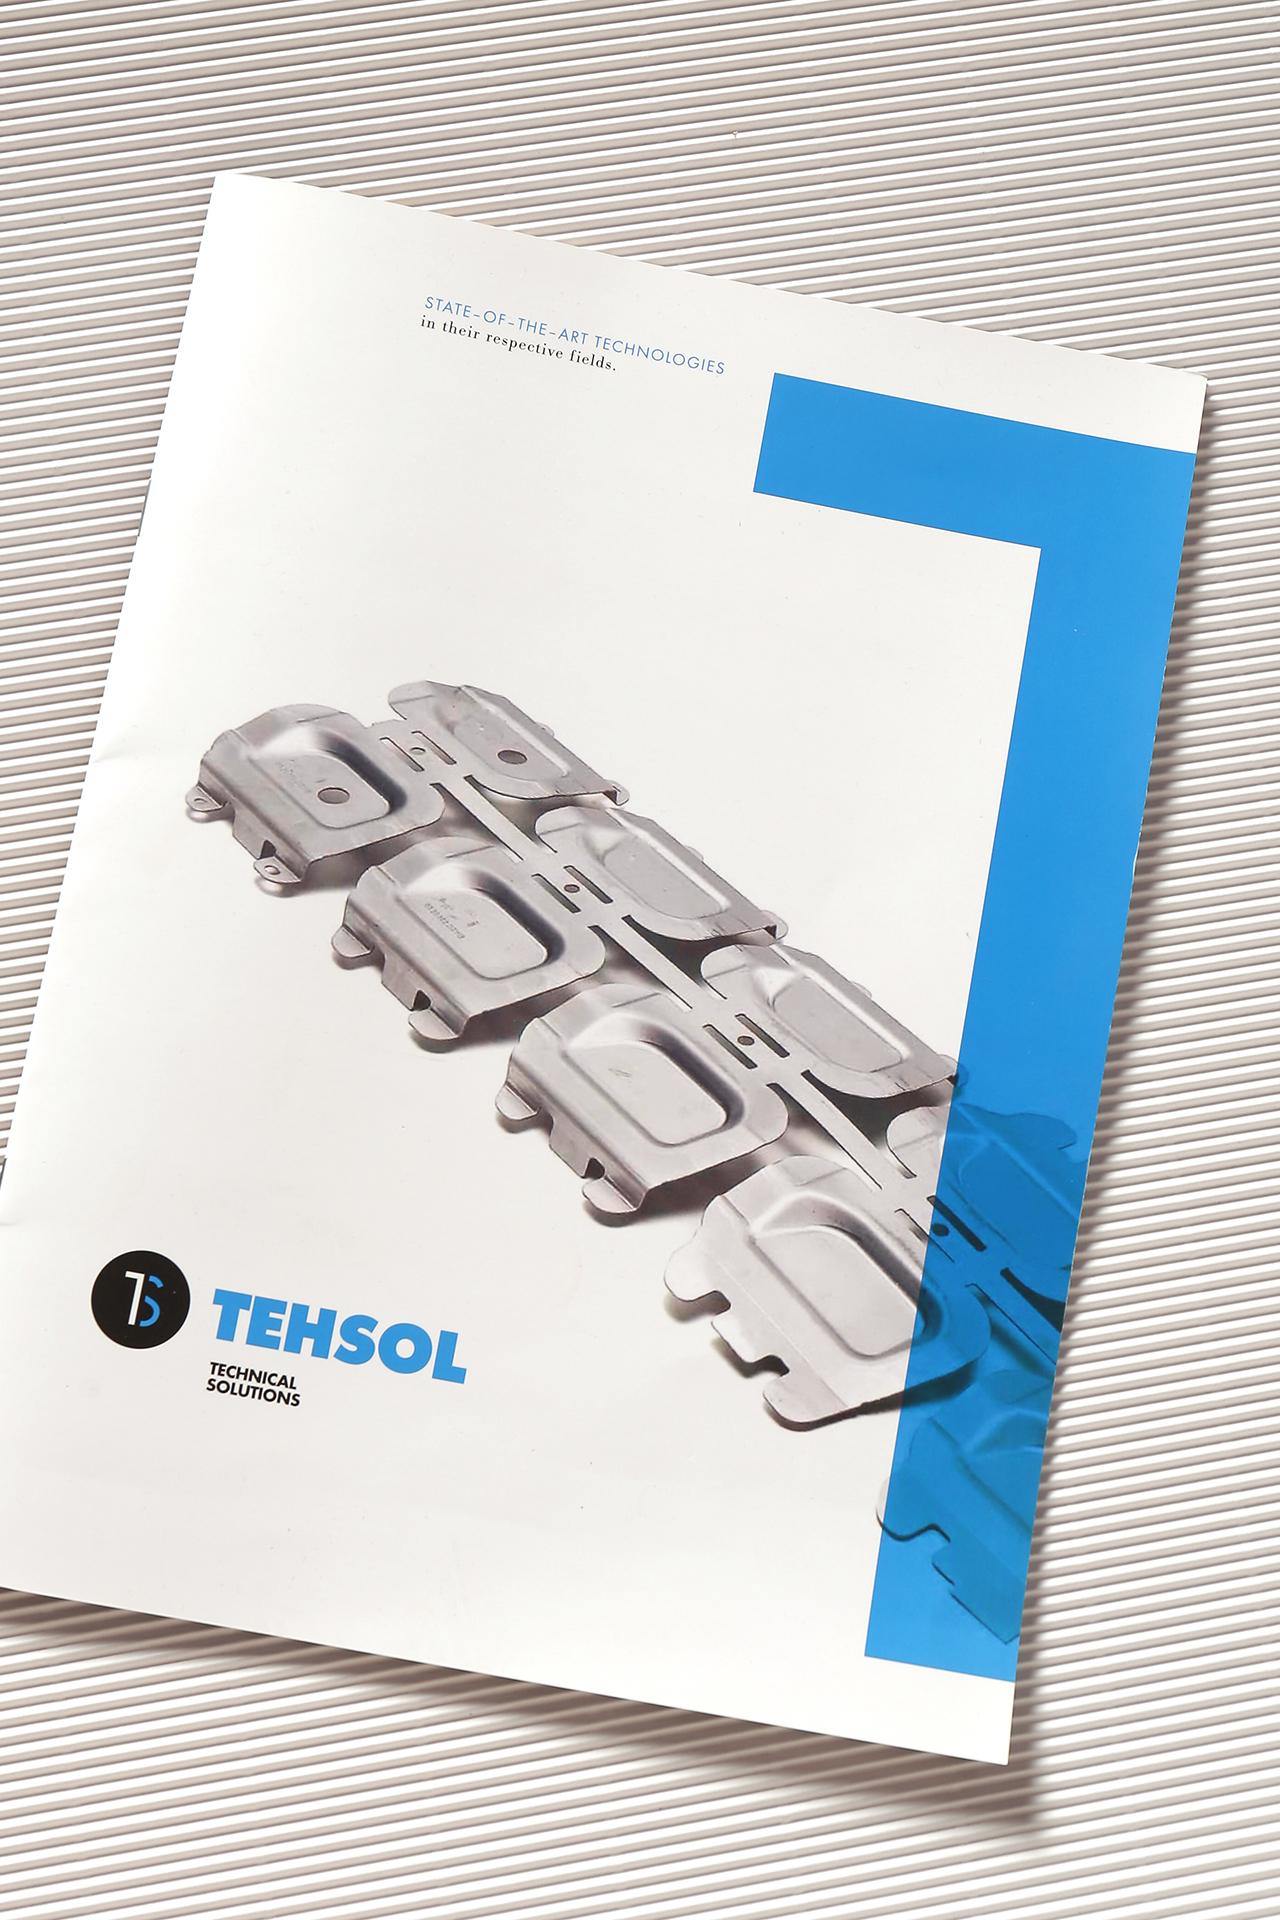 tehsol_katalog_3